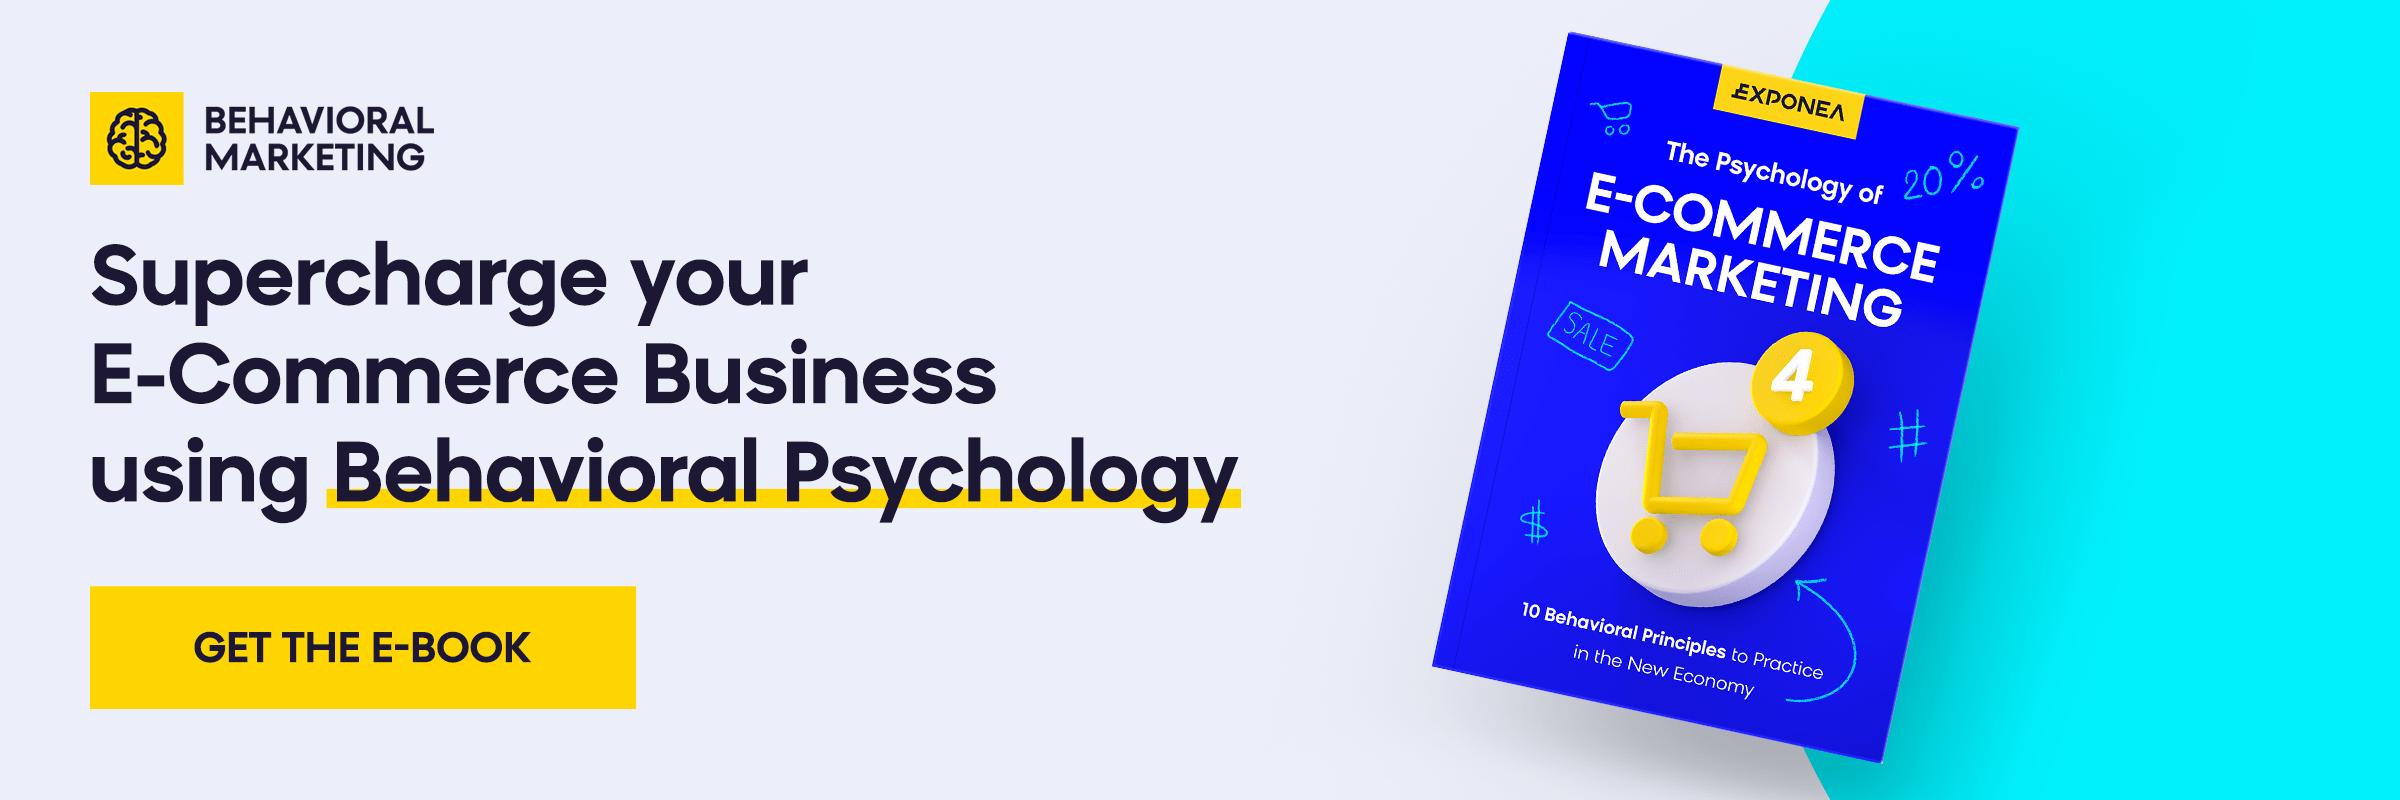 influence consumer behavior-with-marketing psychology - ebook